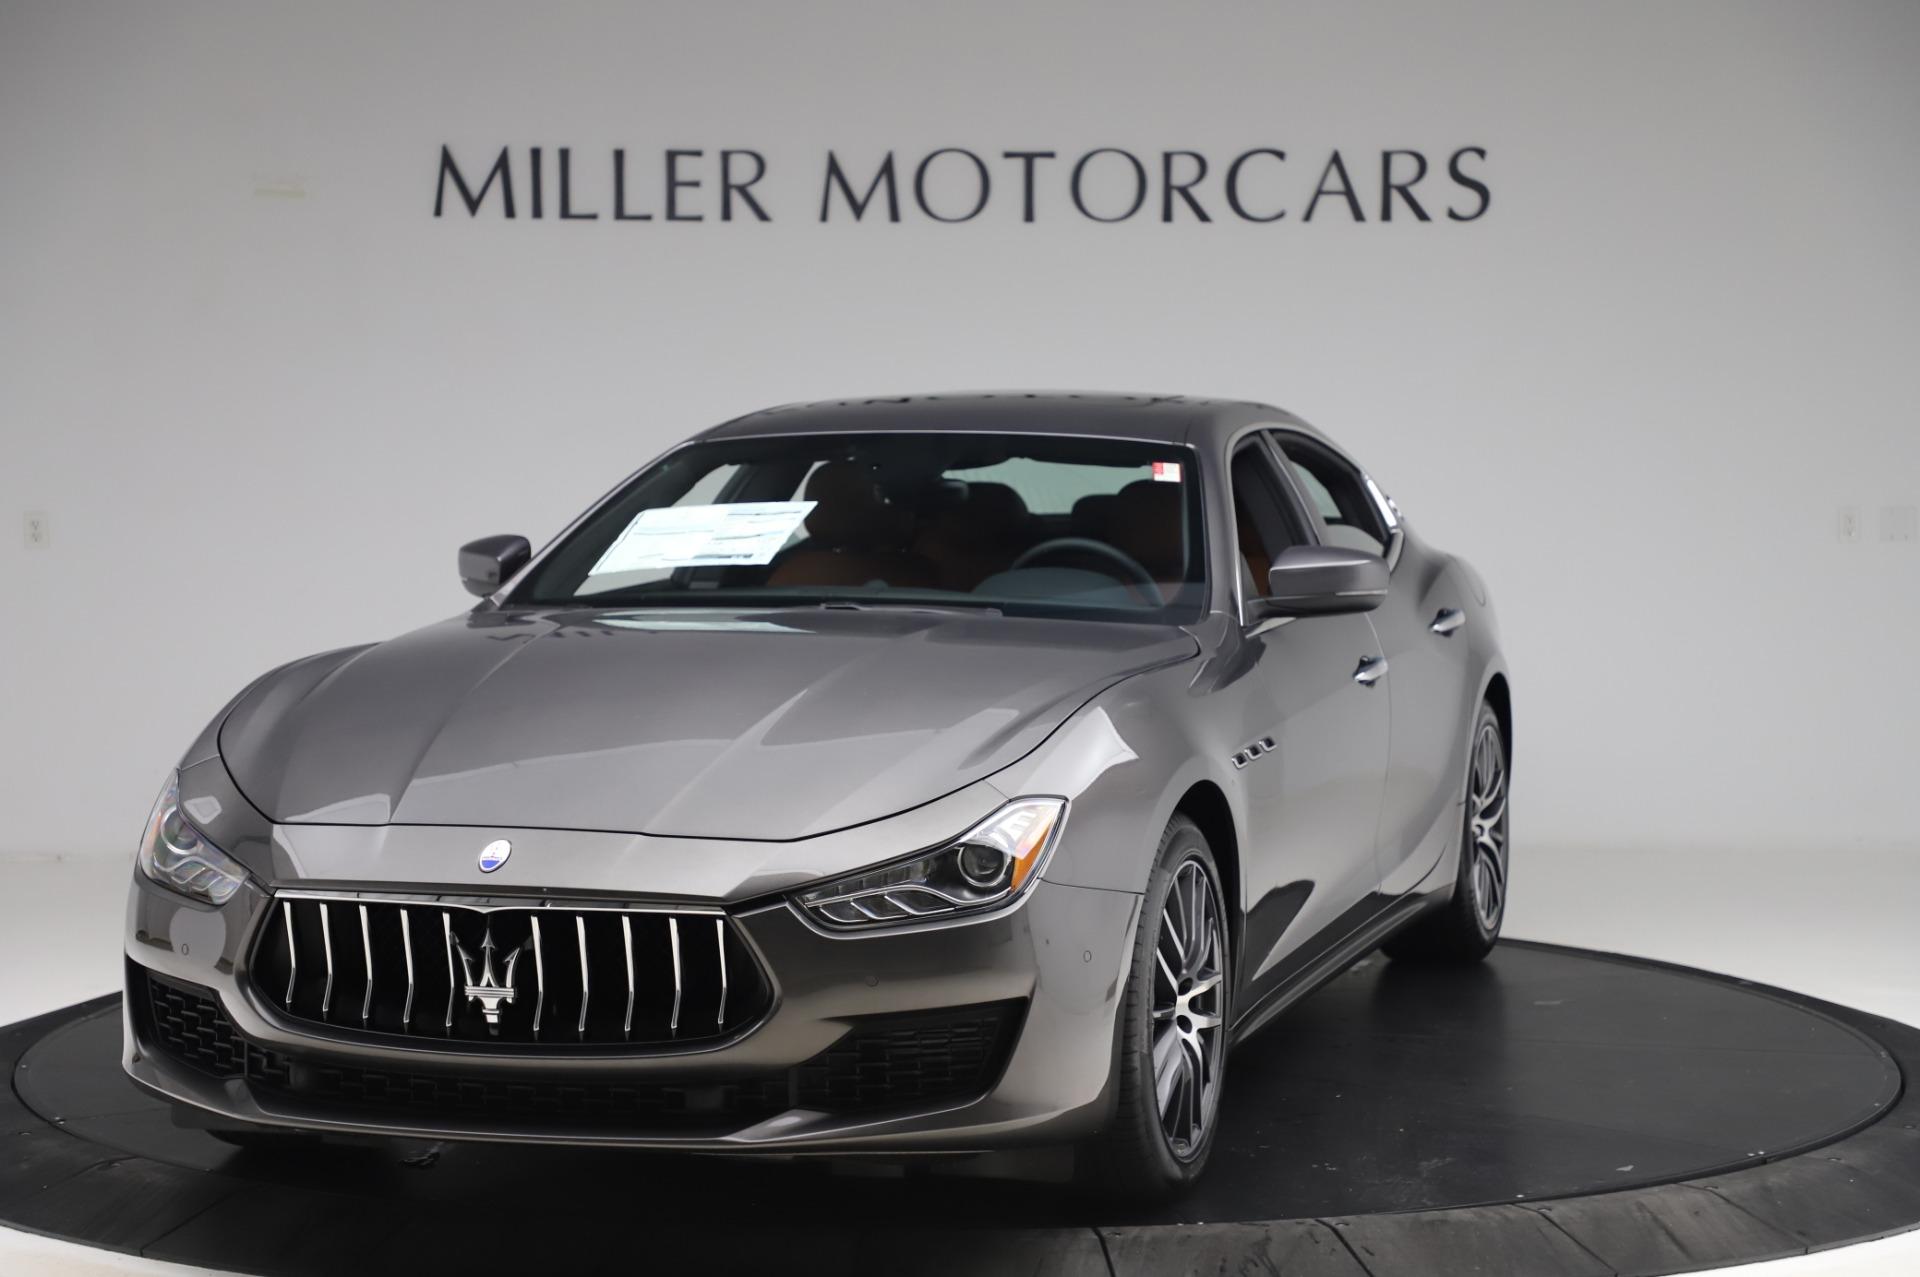 New 2020 Maserati Ghibli S Q4 for sale $82,385 at McLaren Greenwich in Greenwich CT 06830 1